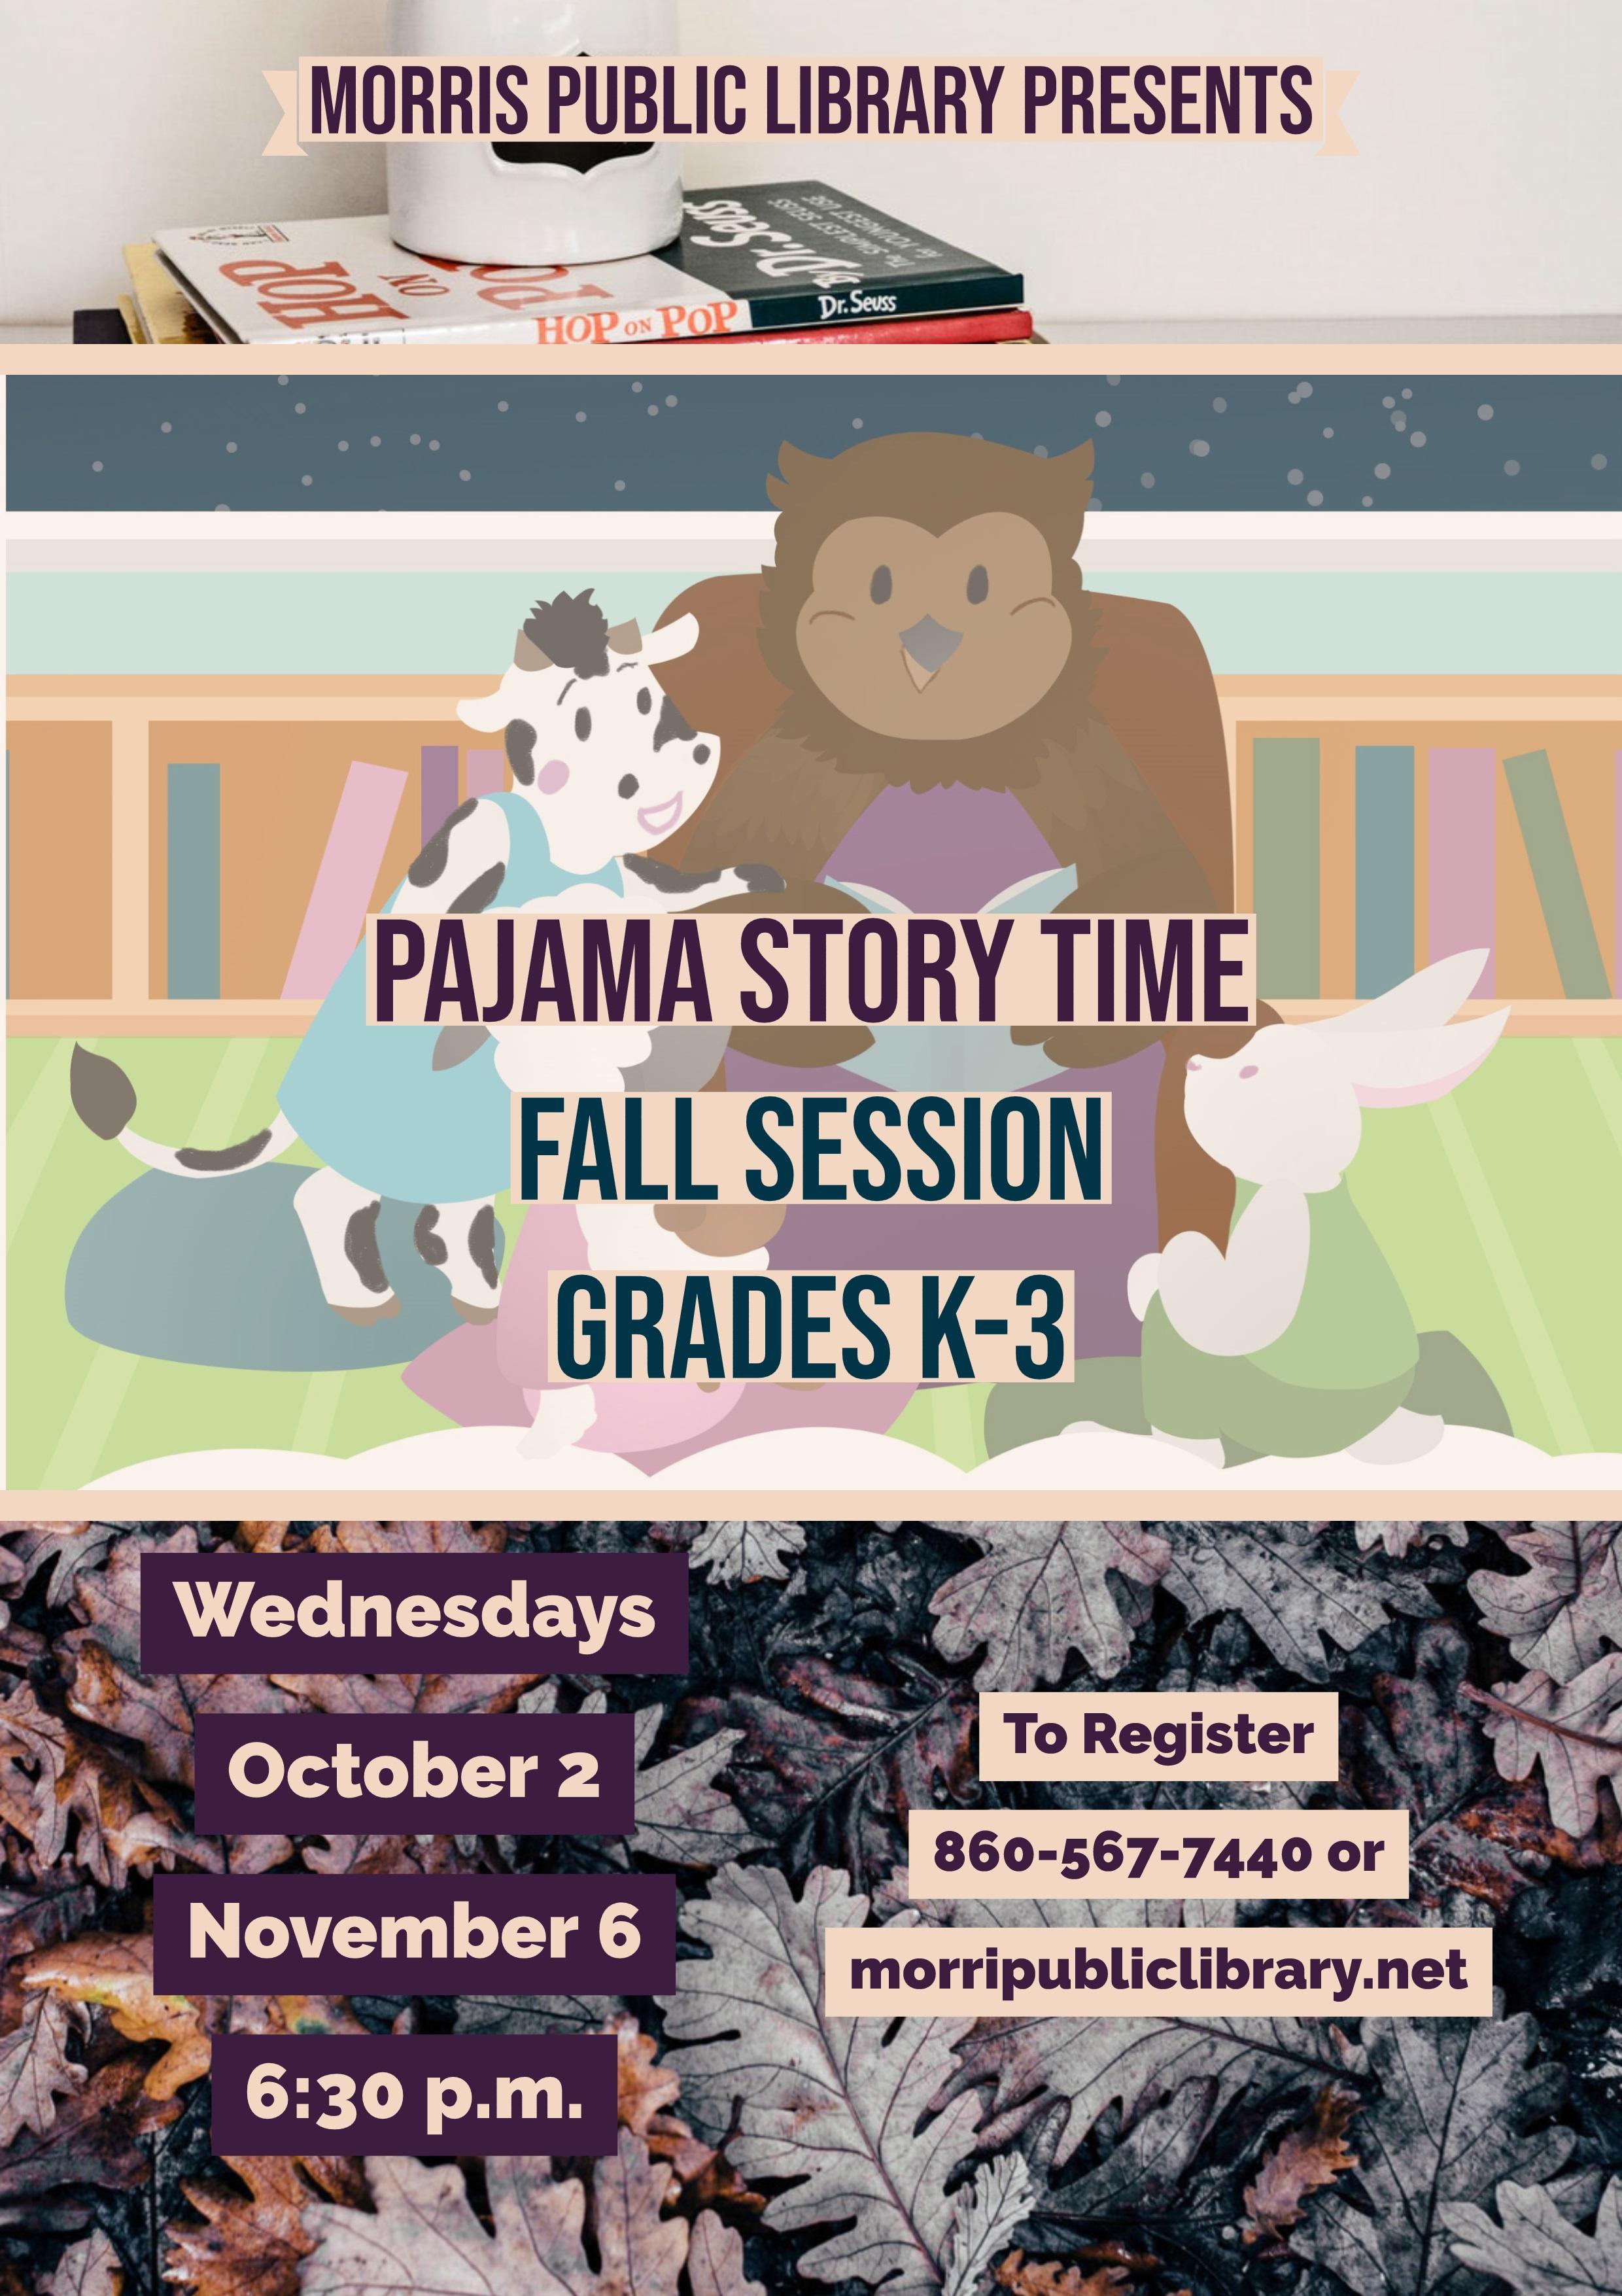 Morris Public Library Pajama Story Time.jpg